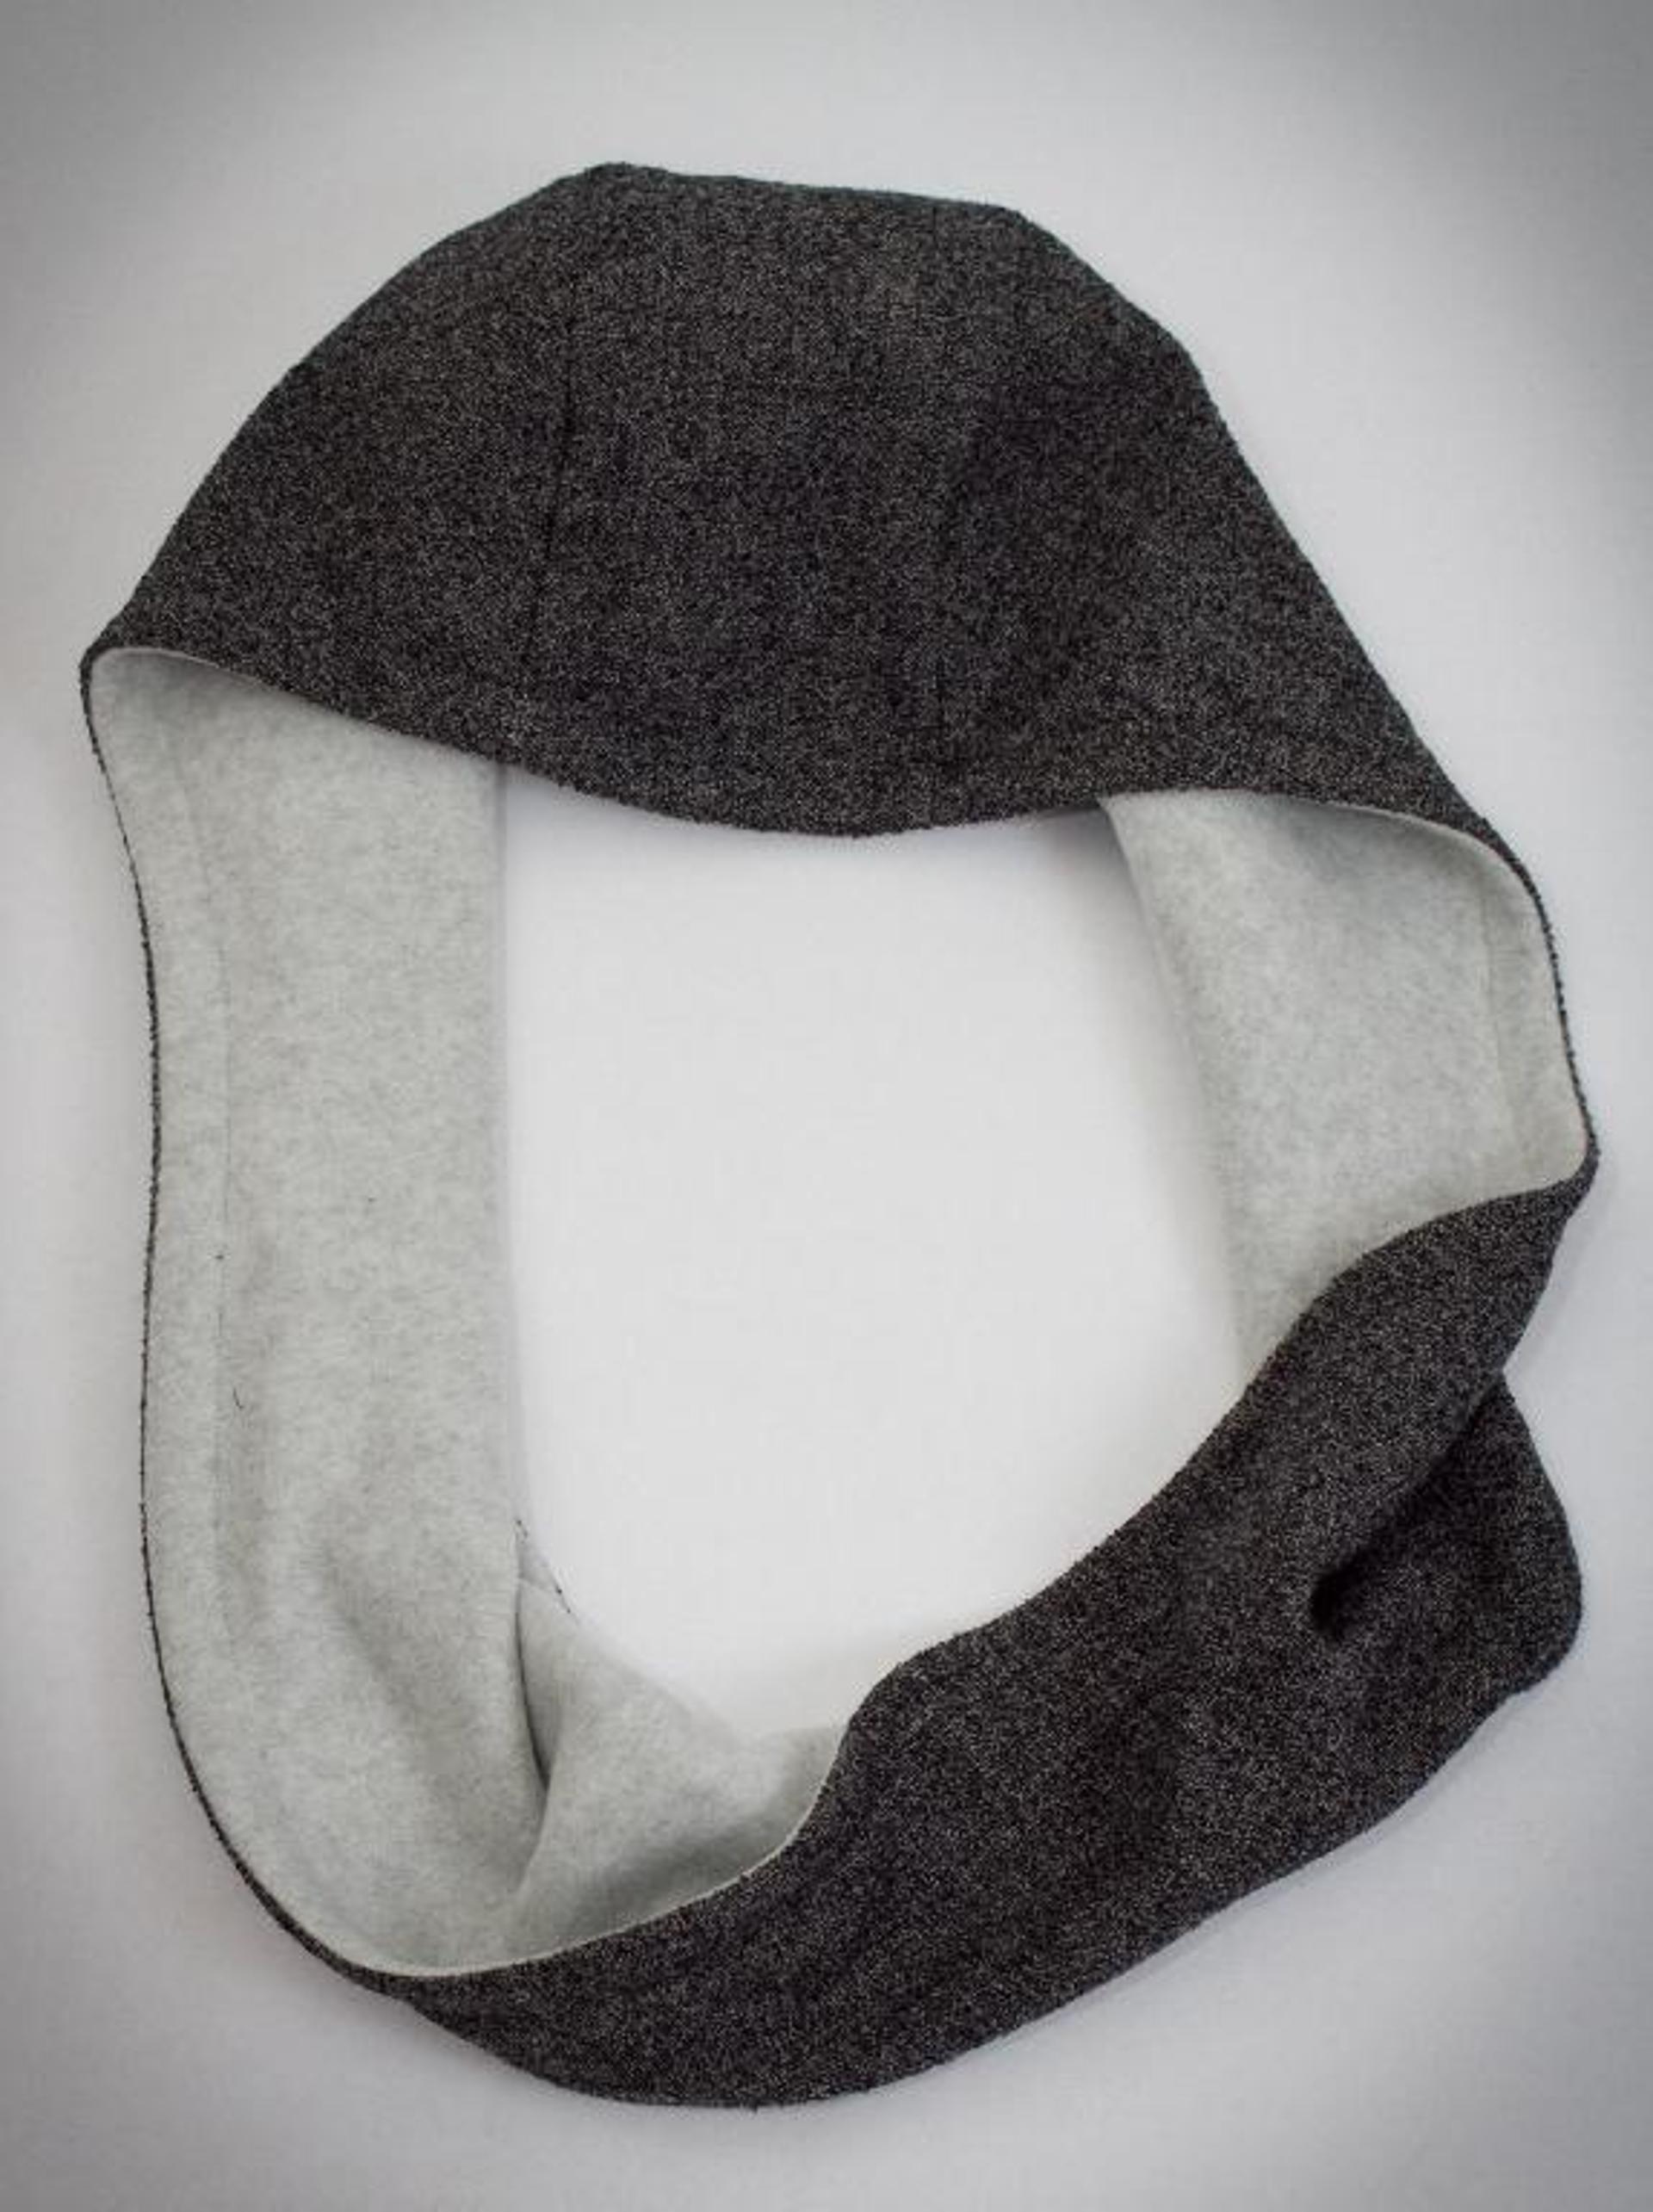 Hooded Scarf Pattern | Pinterest